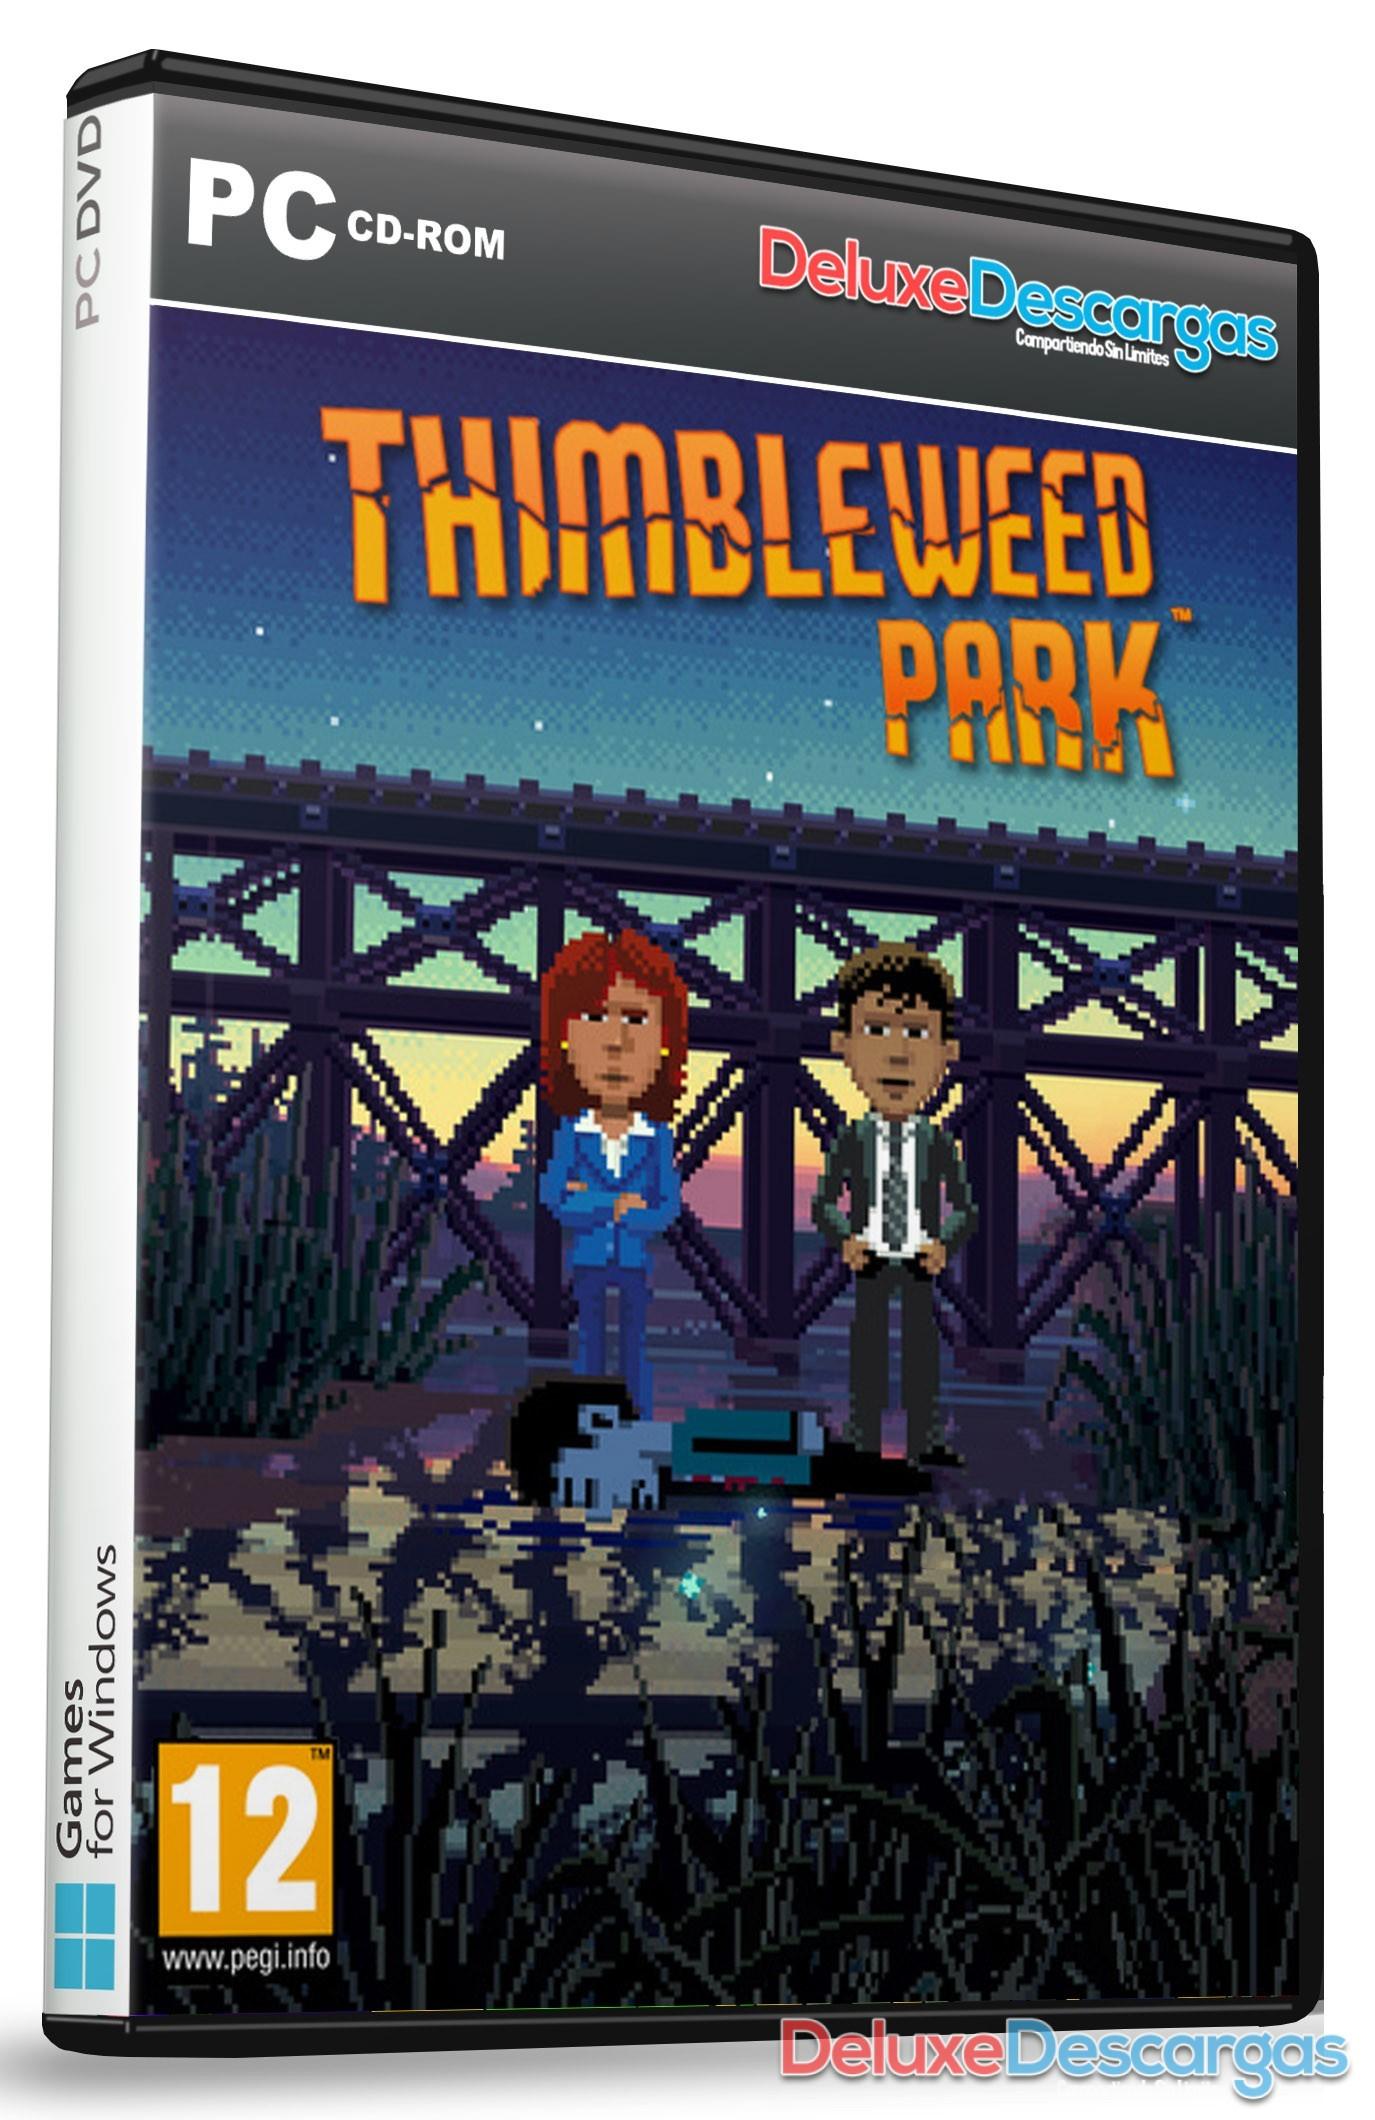 Descargar Thimbleweed Park Multi Espa 241 Ol Full Pc Game